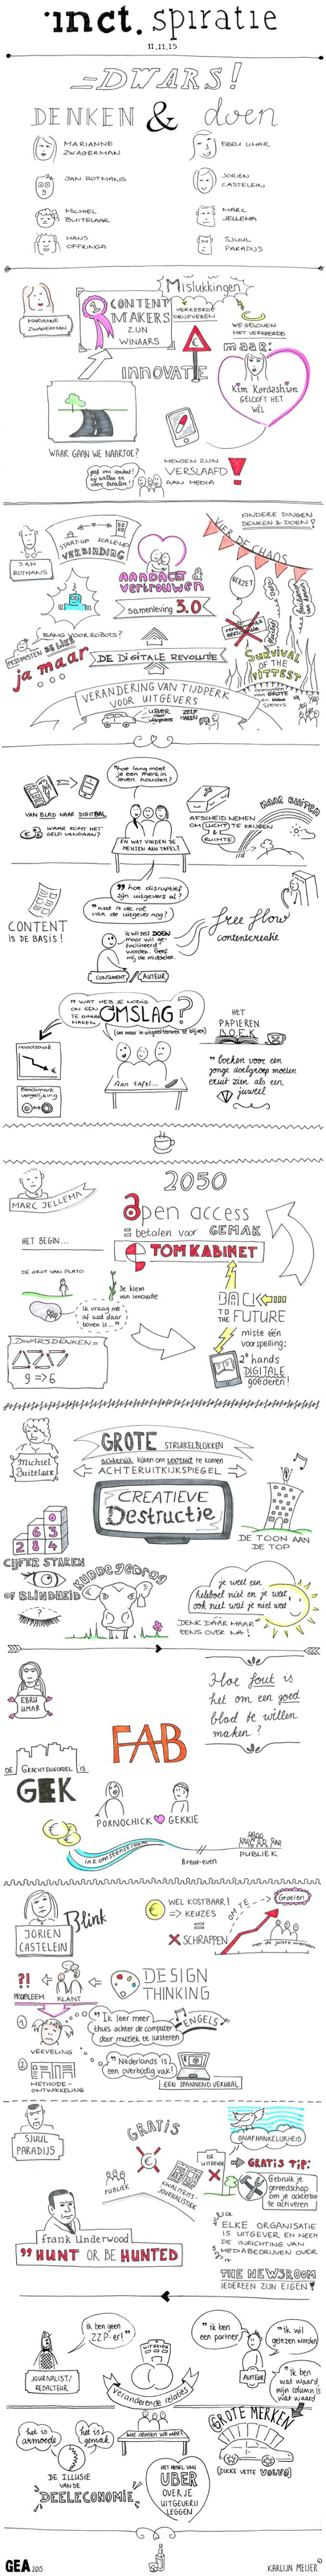 infographic-inct_600px